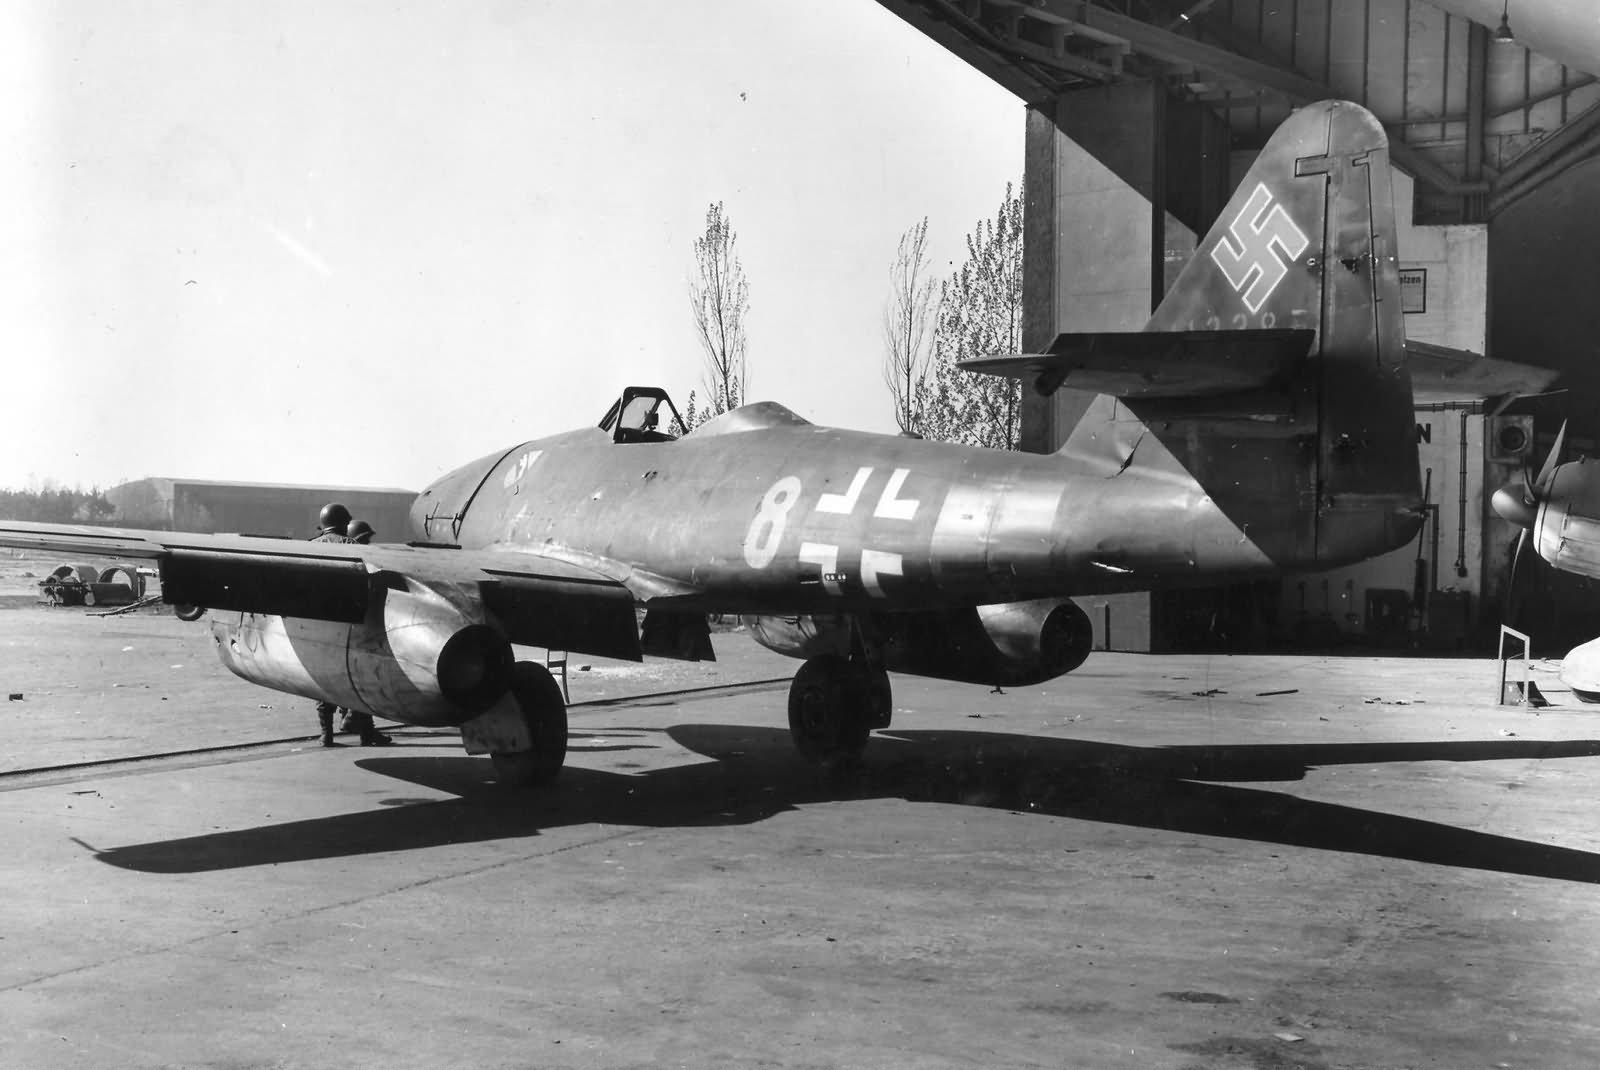 Me262 yellow 8 W. Nr. 112358 of the JG7, Stendal-Borstel Germany 1945